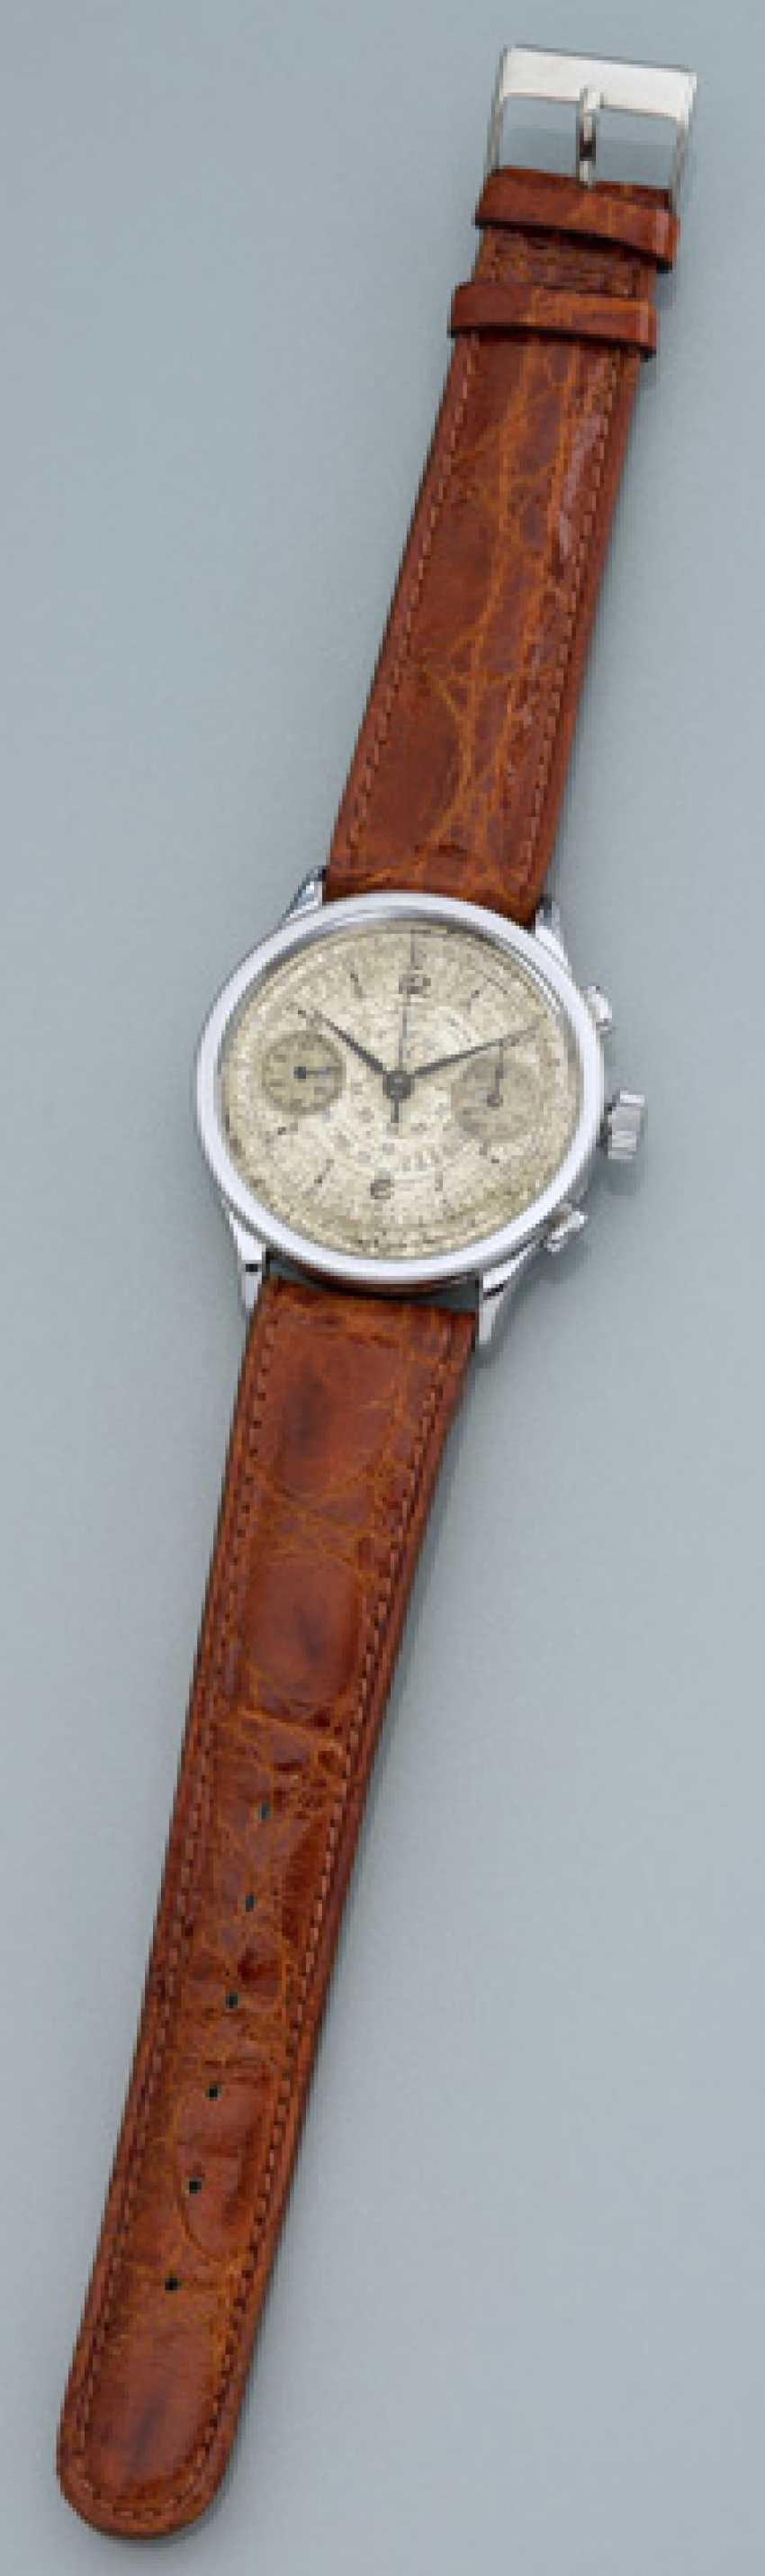 Fruher Oversize Chronograph Tavannes - photo 1